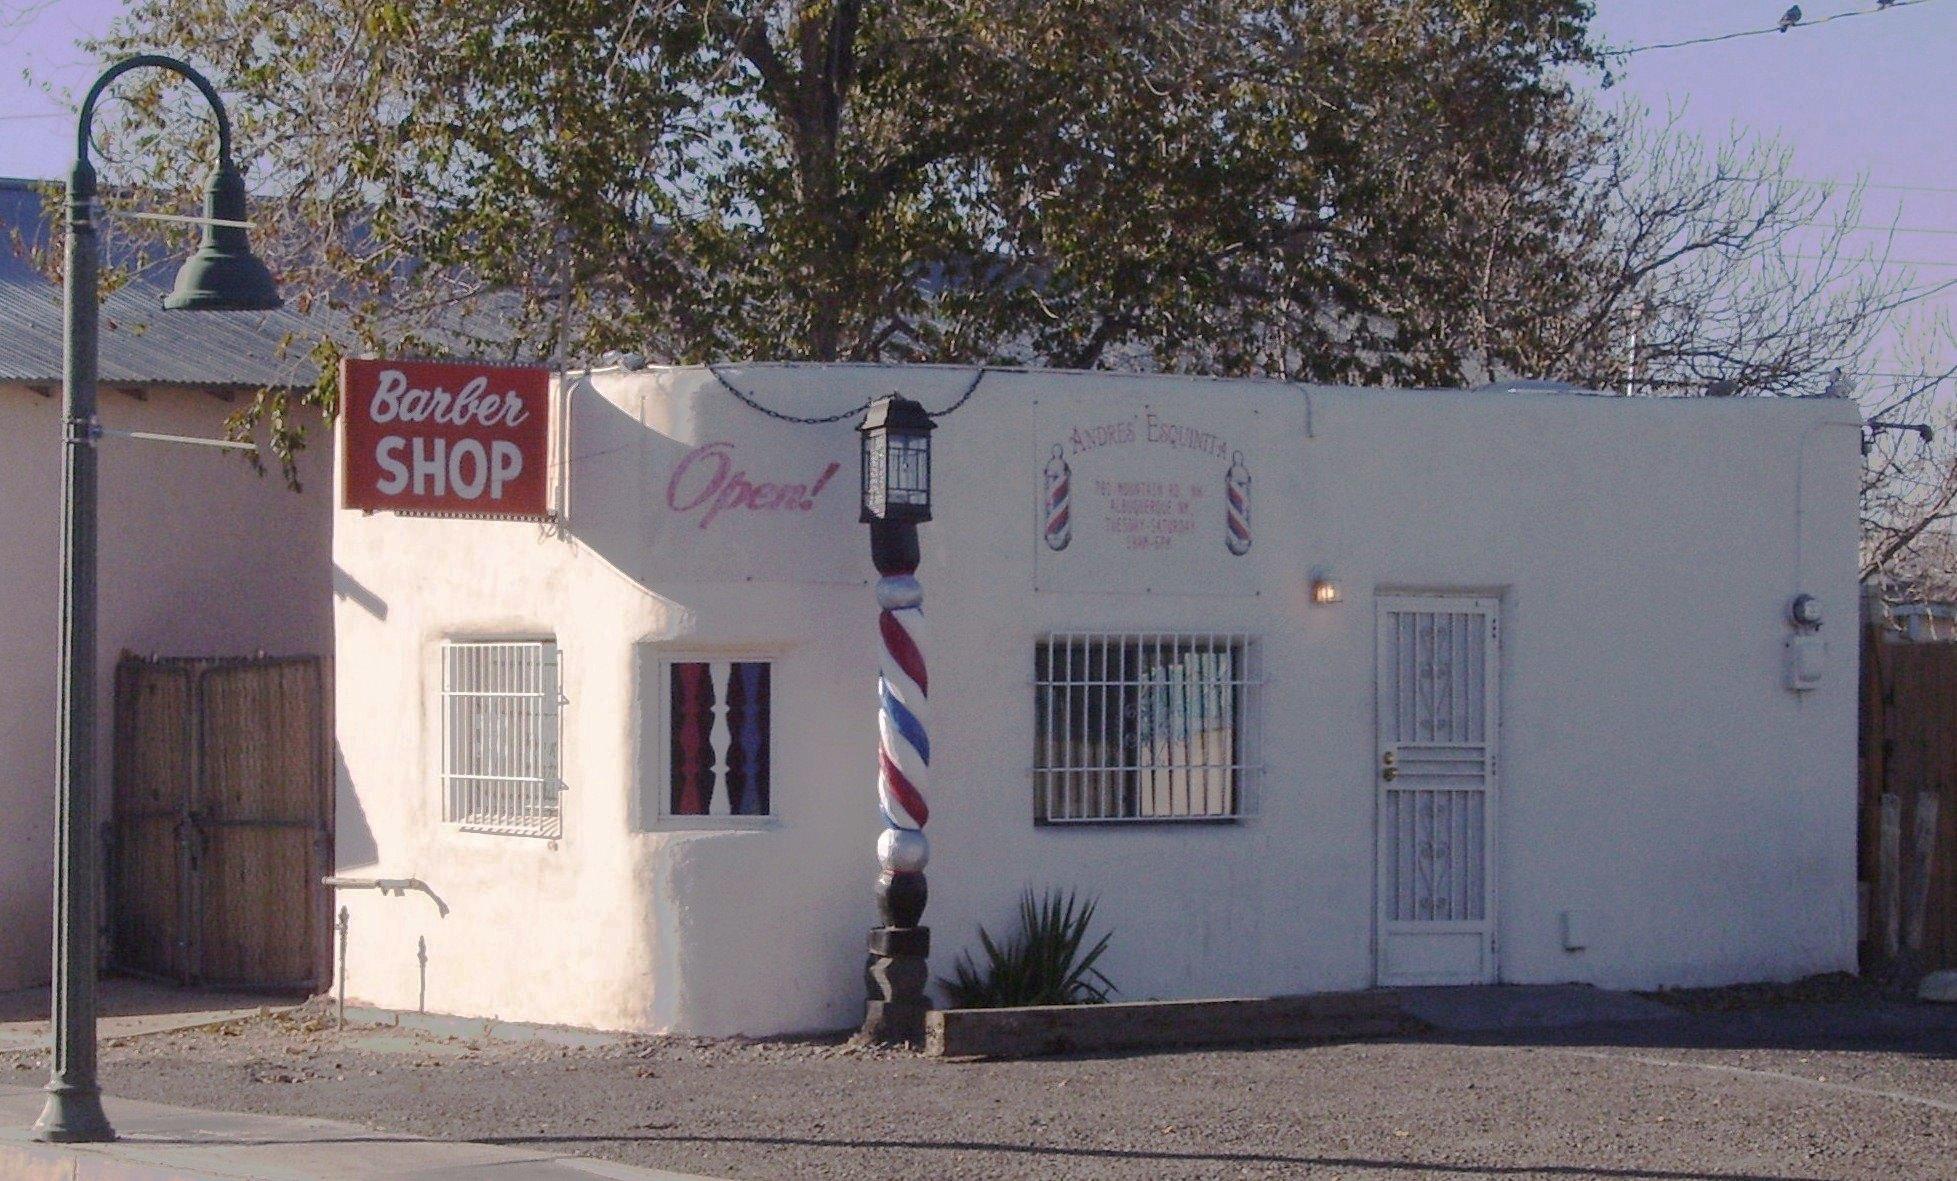 Barber Shops Near My Location : Description Barber shop Mountain Road near Old Town Albuquerque.jpg